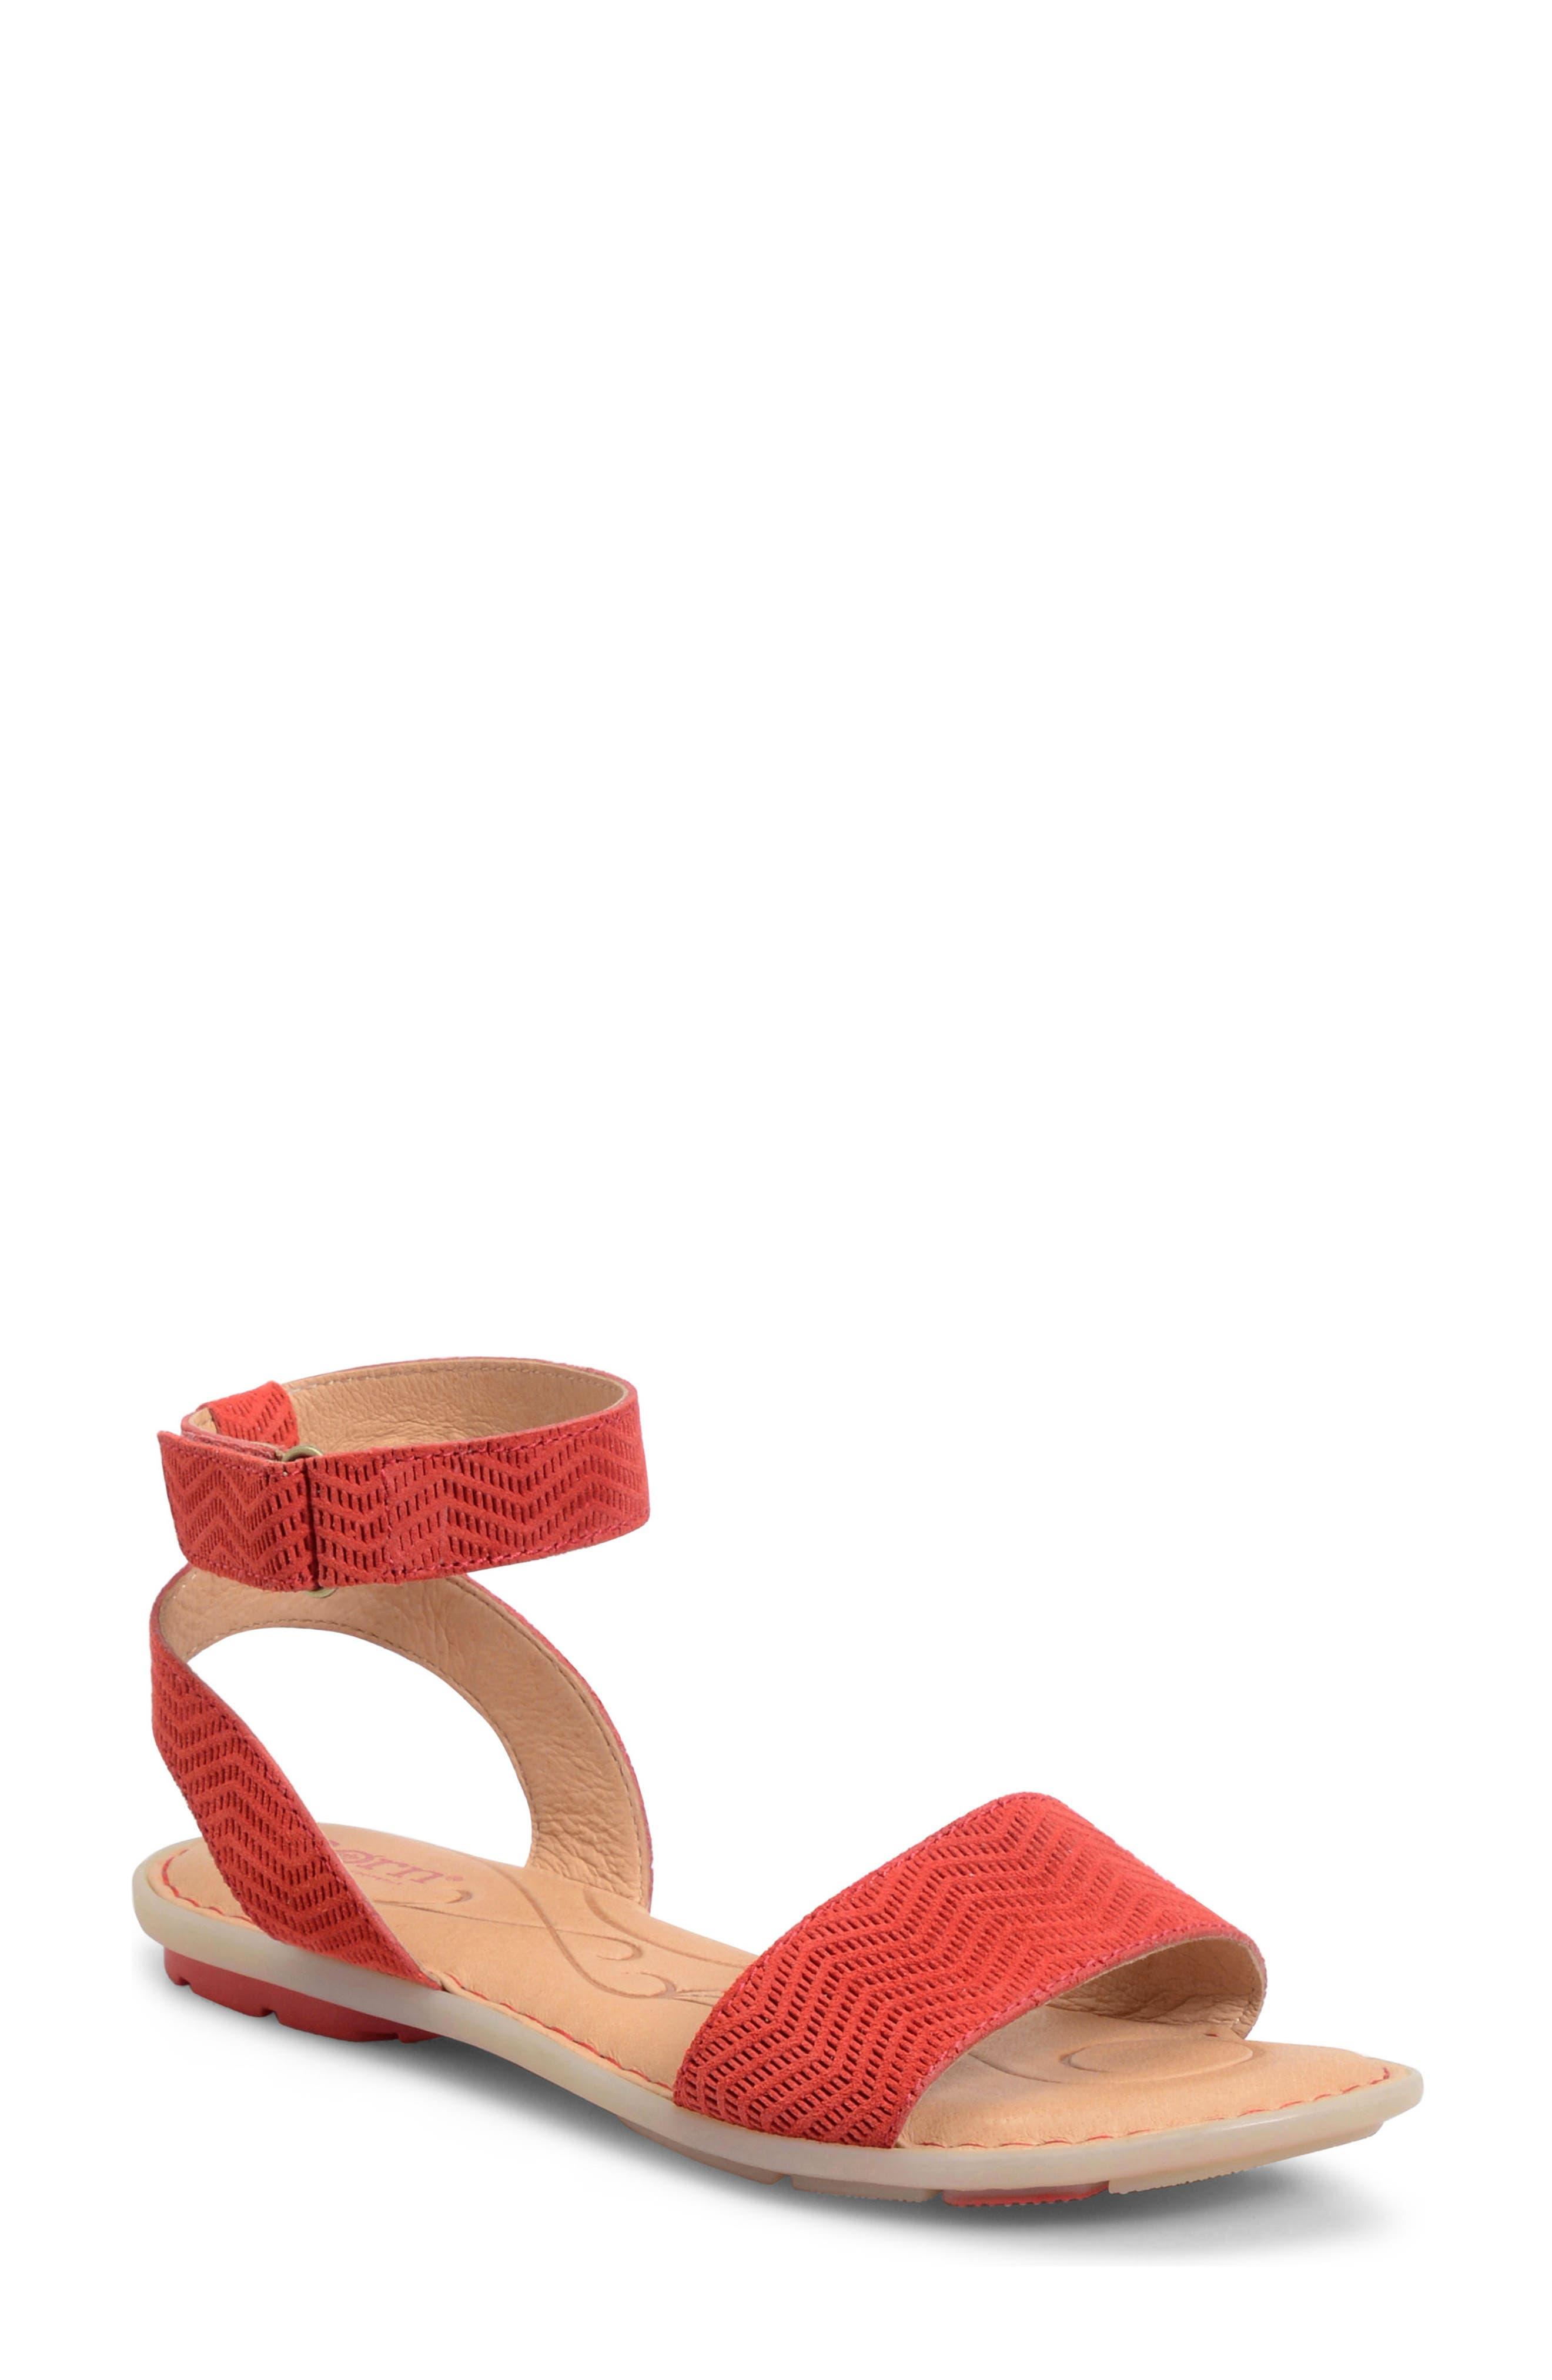 Alternate Image 1 Selected - Børn Tegal Sandal (Women)